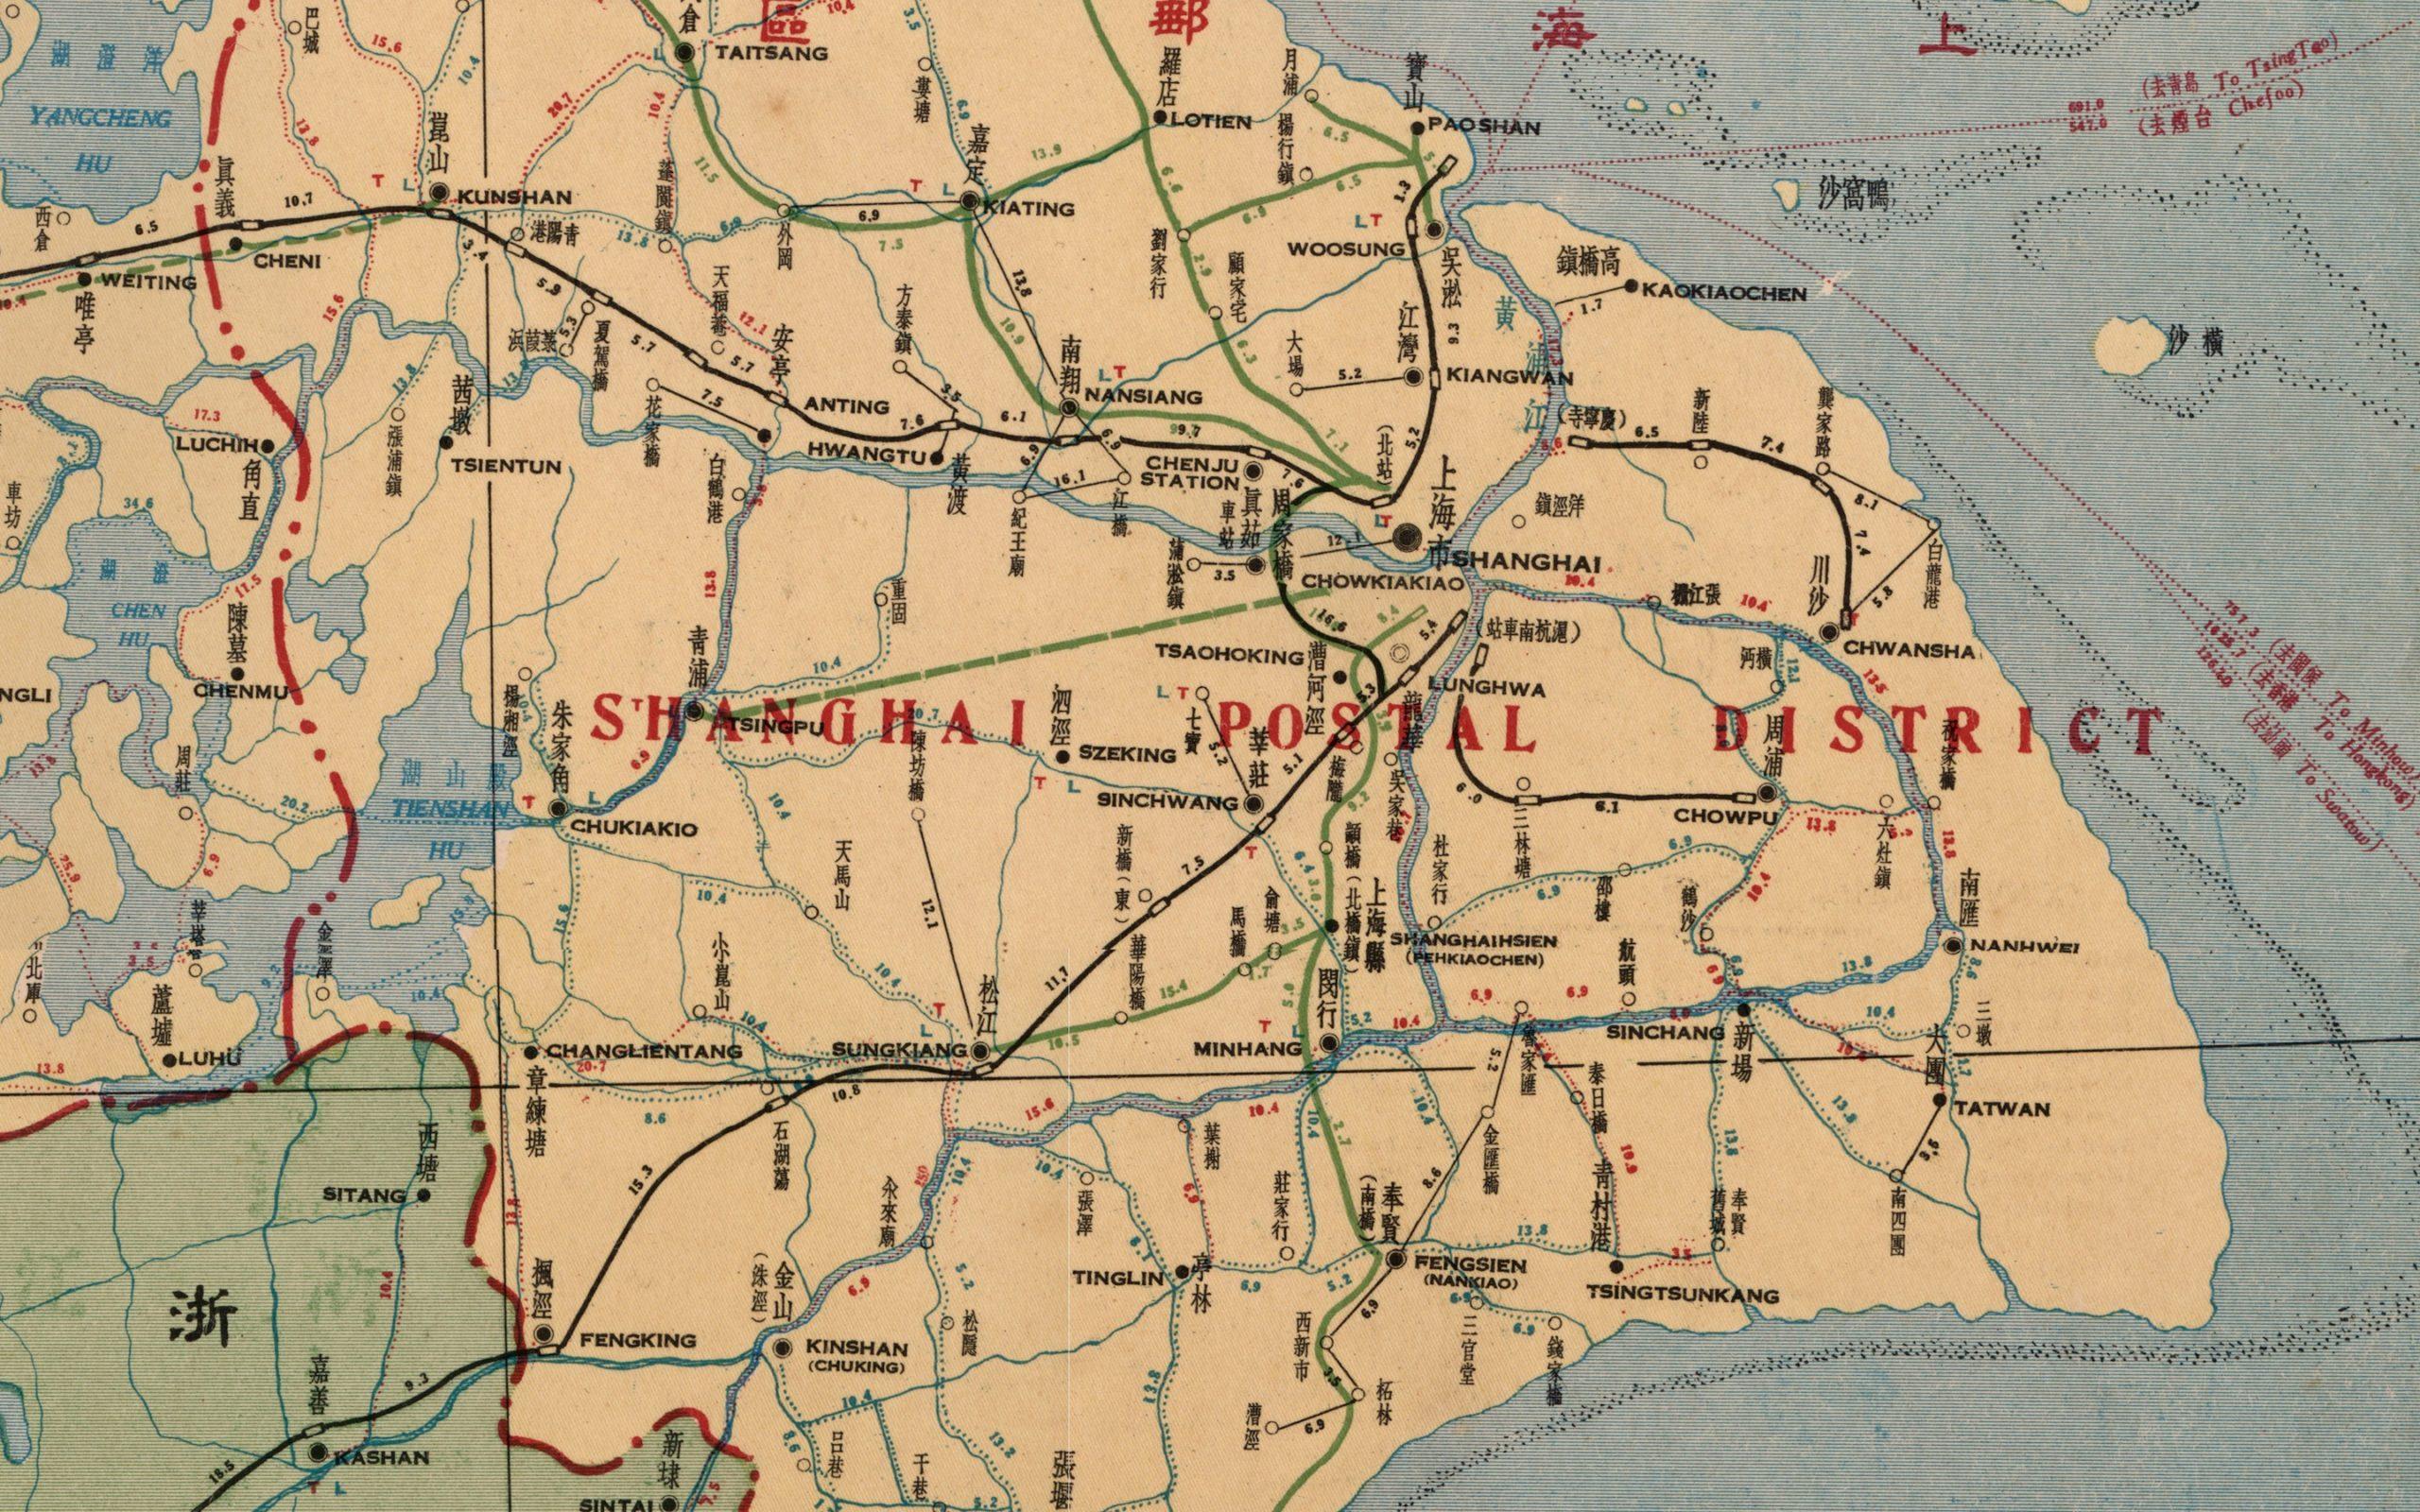 Nanking Directorate General of Posts. Postal map of Jiangsu-Shanghai postal district, 1935. Detail of Shanghai on the map, photograph.